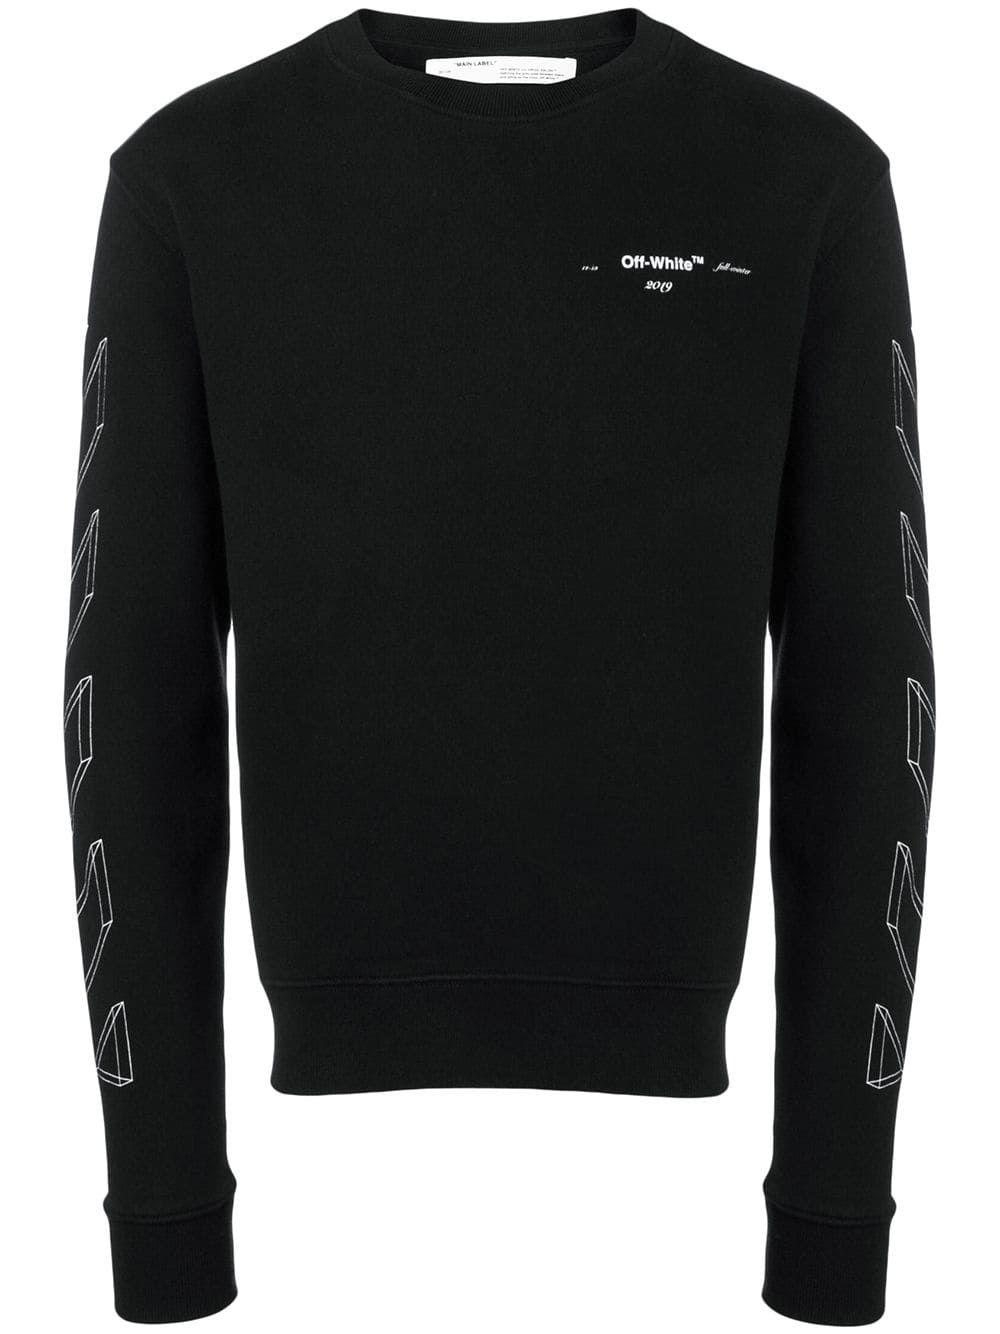 Off White Diag 3d Carryover Crewneck In Black White Modesens Printed Sweatshirts Sweatshirts Black Sweatshirts [ 1334 x 1000 Pixel ]